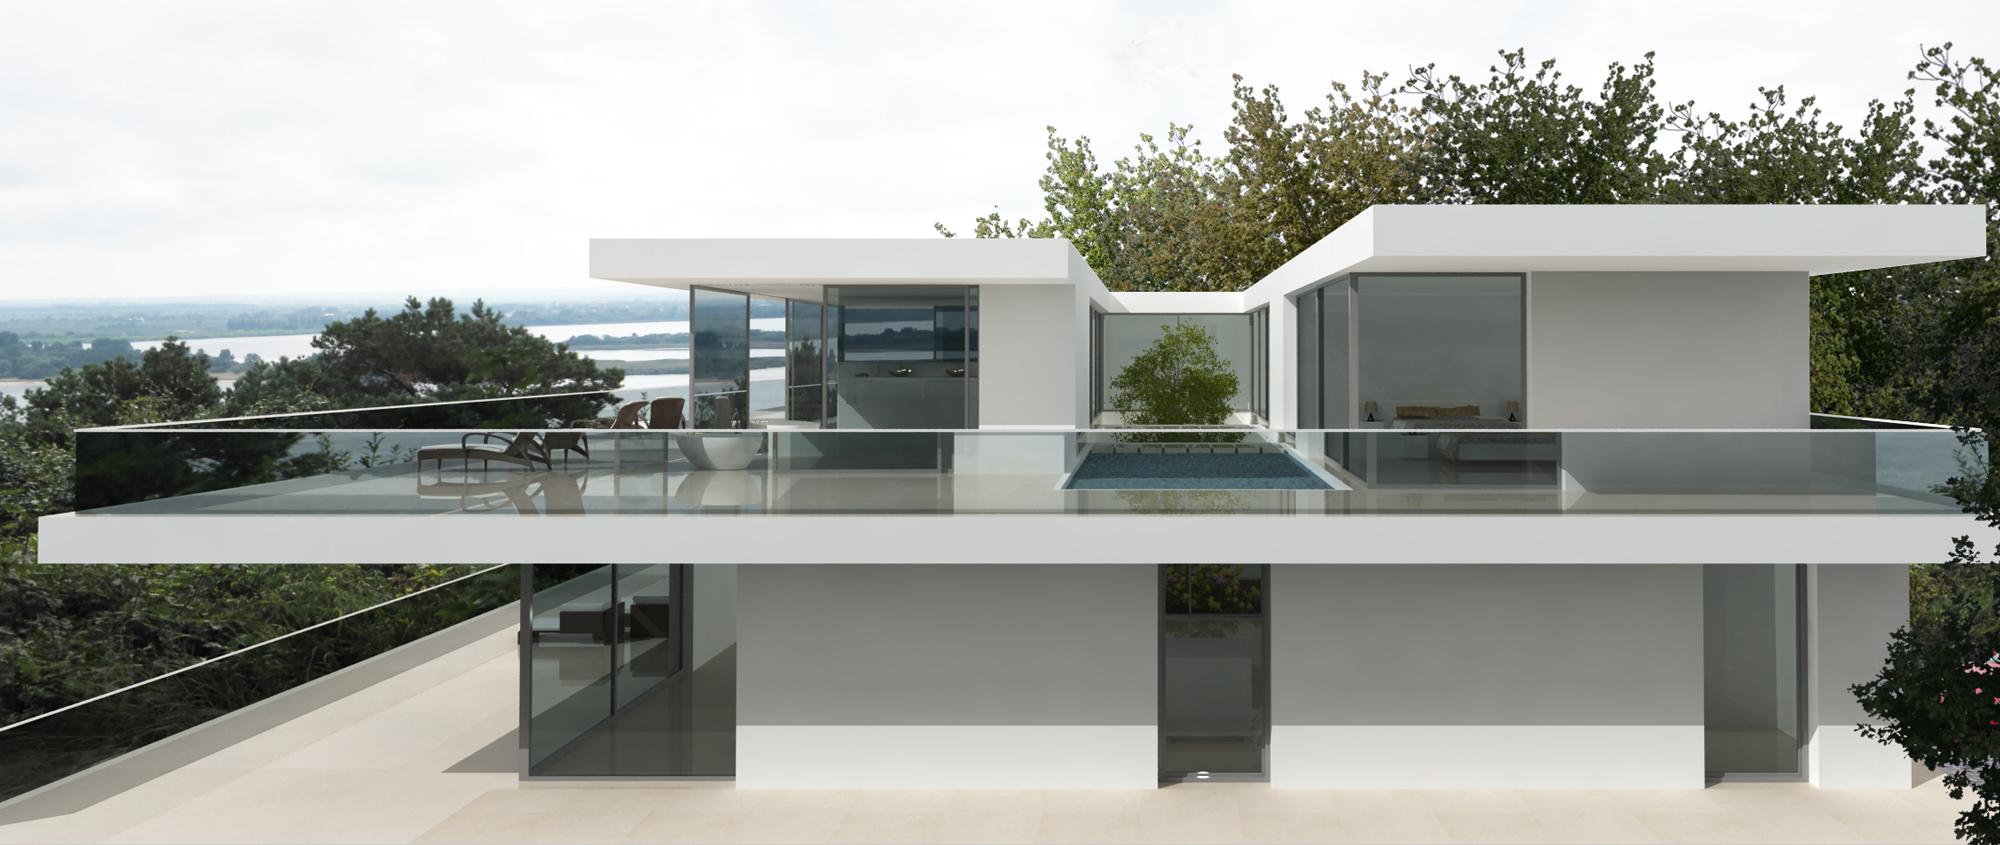 Architekten Hamburg - BAT | Bureau for Advanced Tectonic